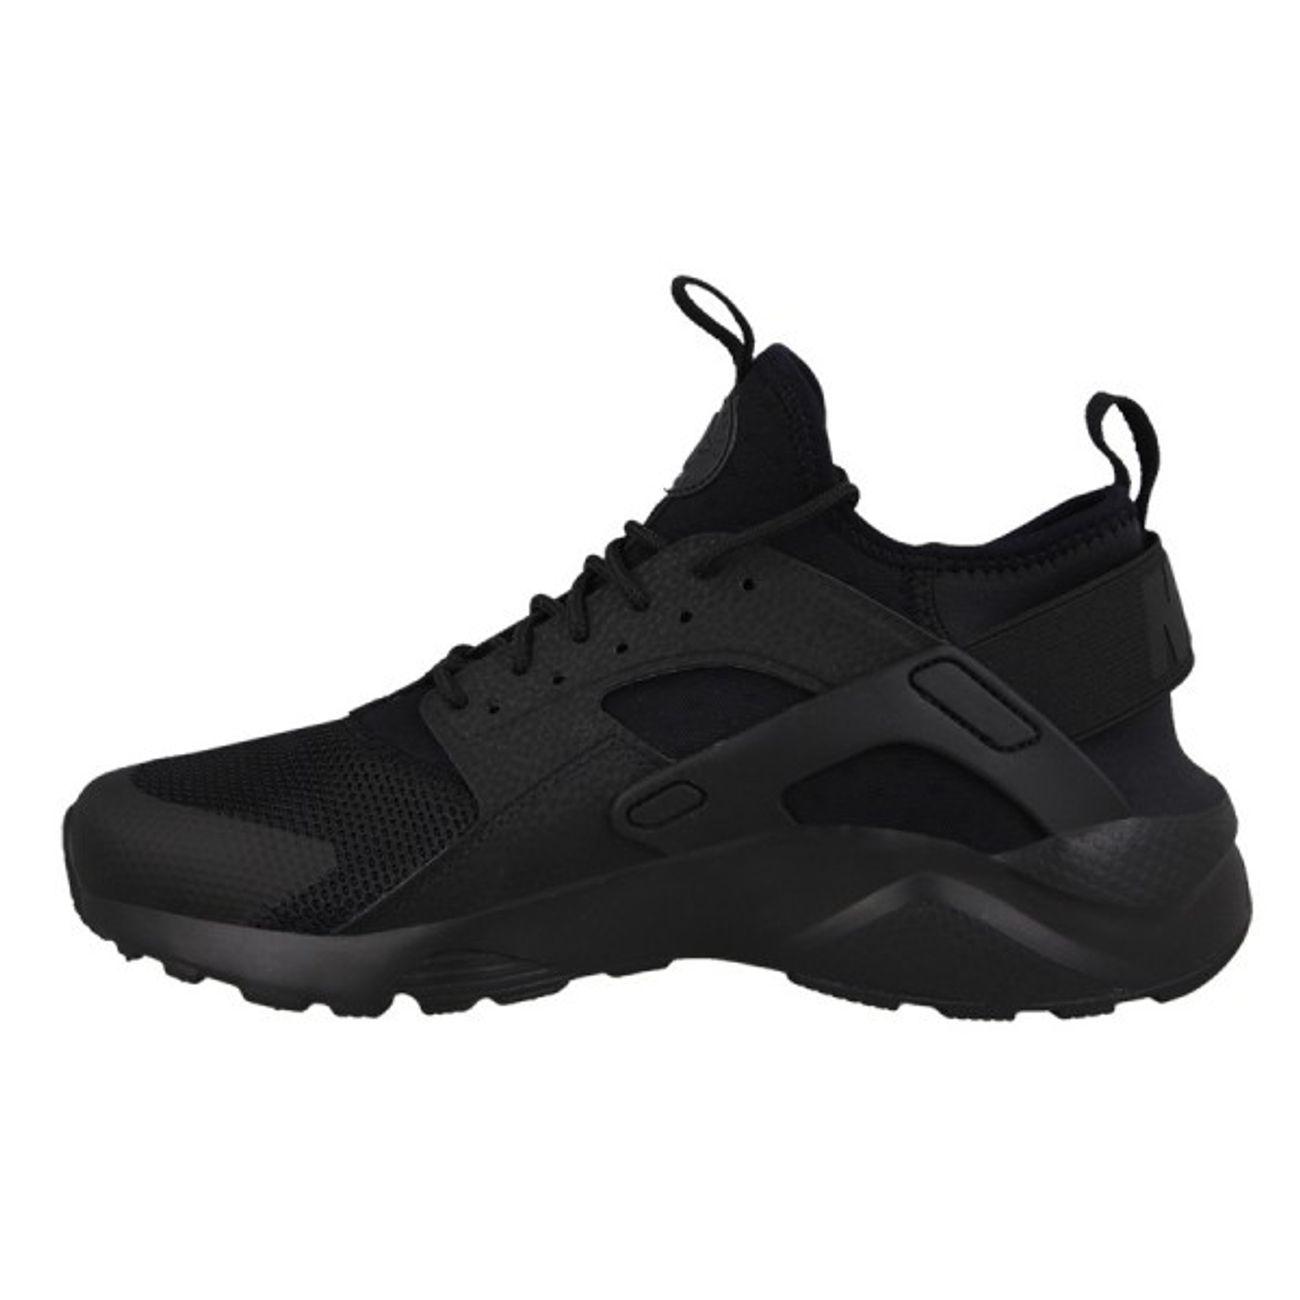 new product 0ffd3 603e8 ... Mode- Lifestyle enfant NIKE Basket Nike Air Huarache Run (GS) - 847569-  ...